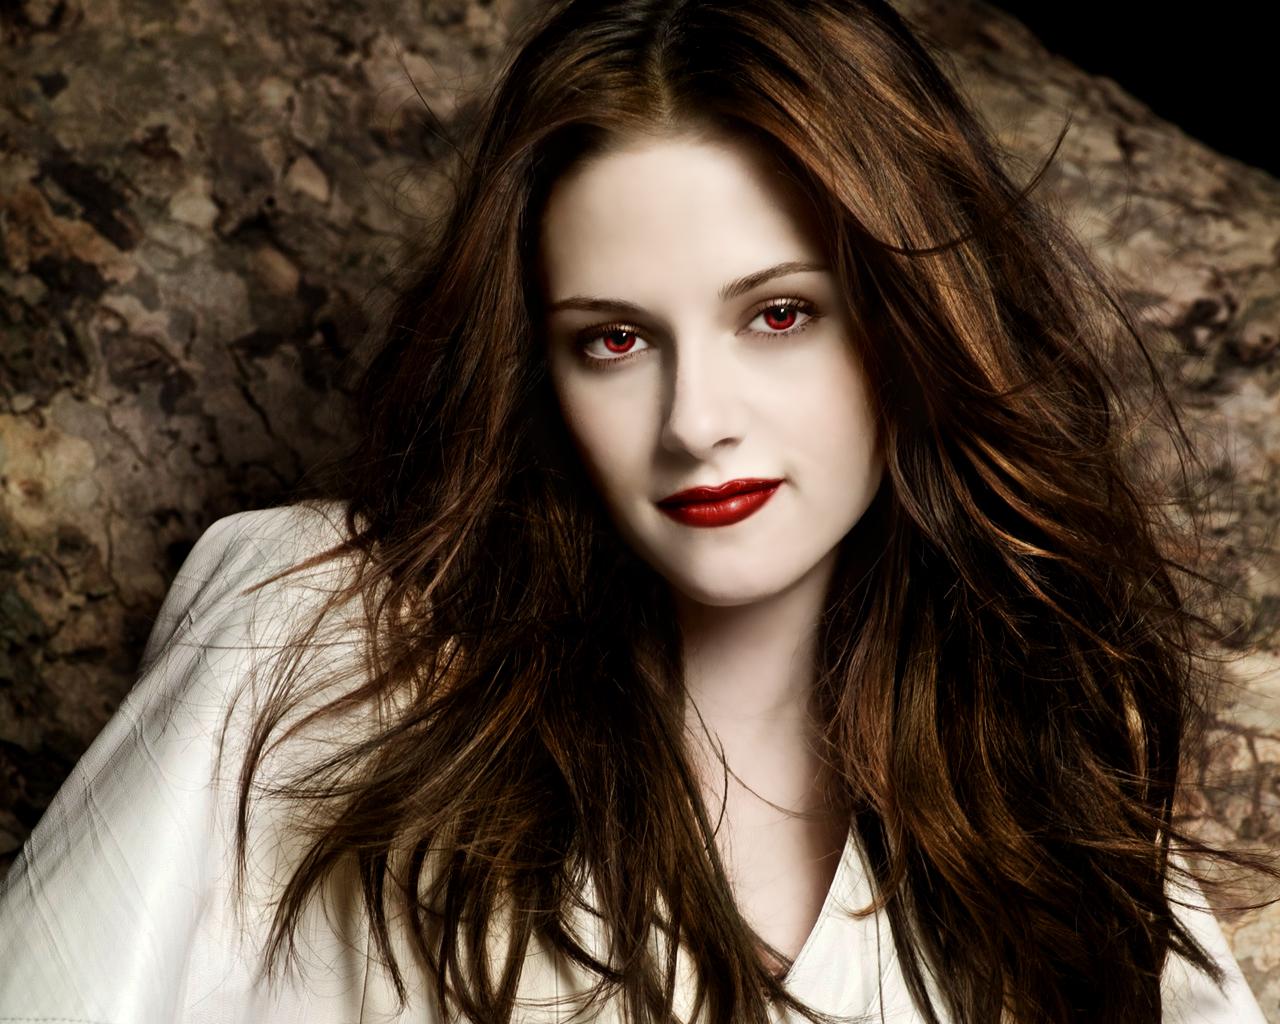 bella cullen as a vampire by danicaj on deviantart